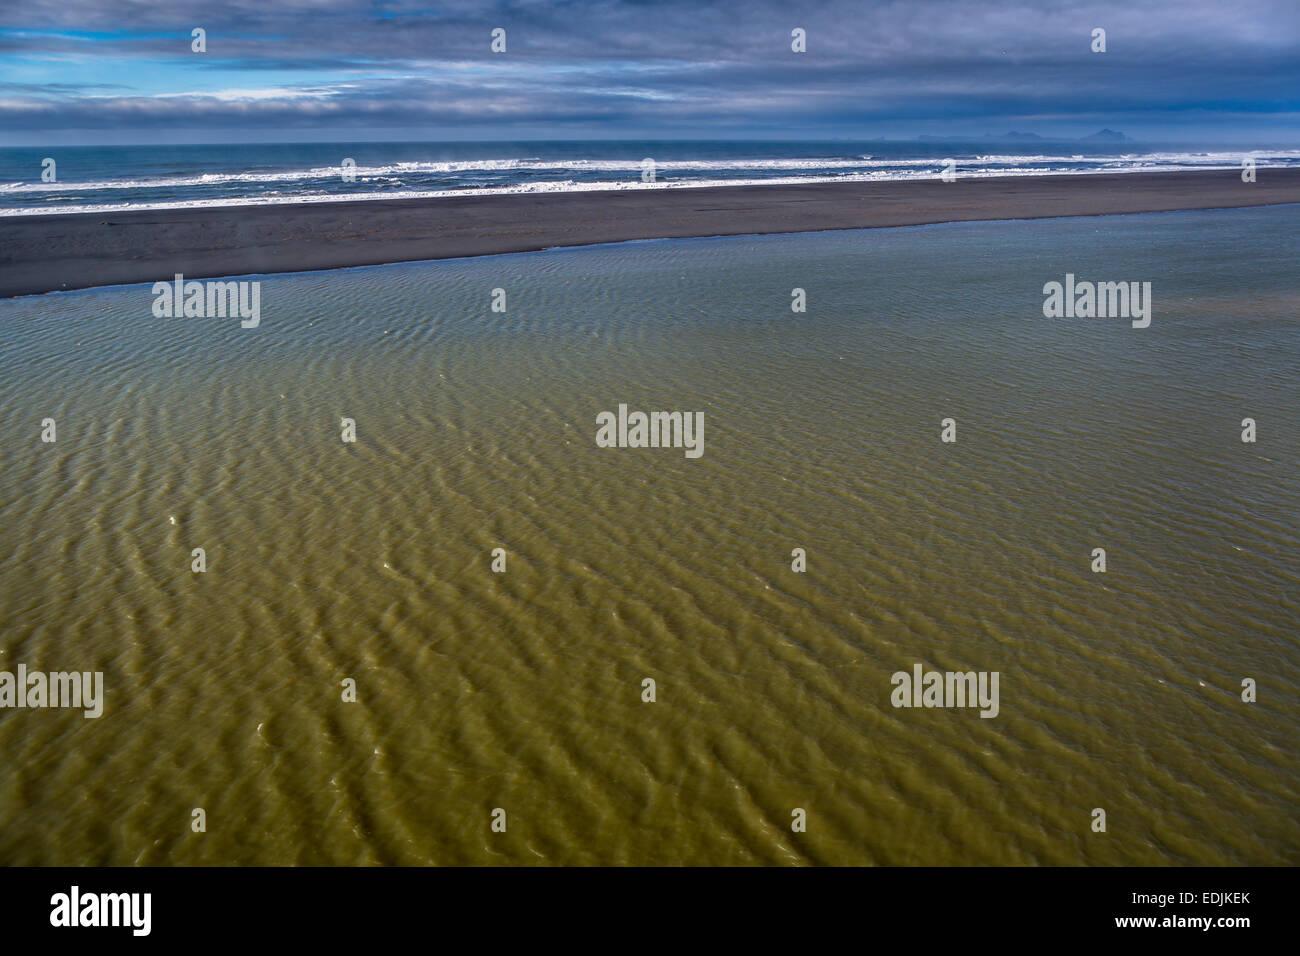 Sandbar, Markarfljotsaurar outwash plain, South Coast, Iceland - Stock Image